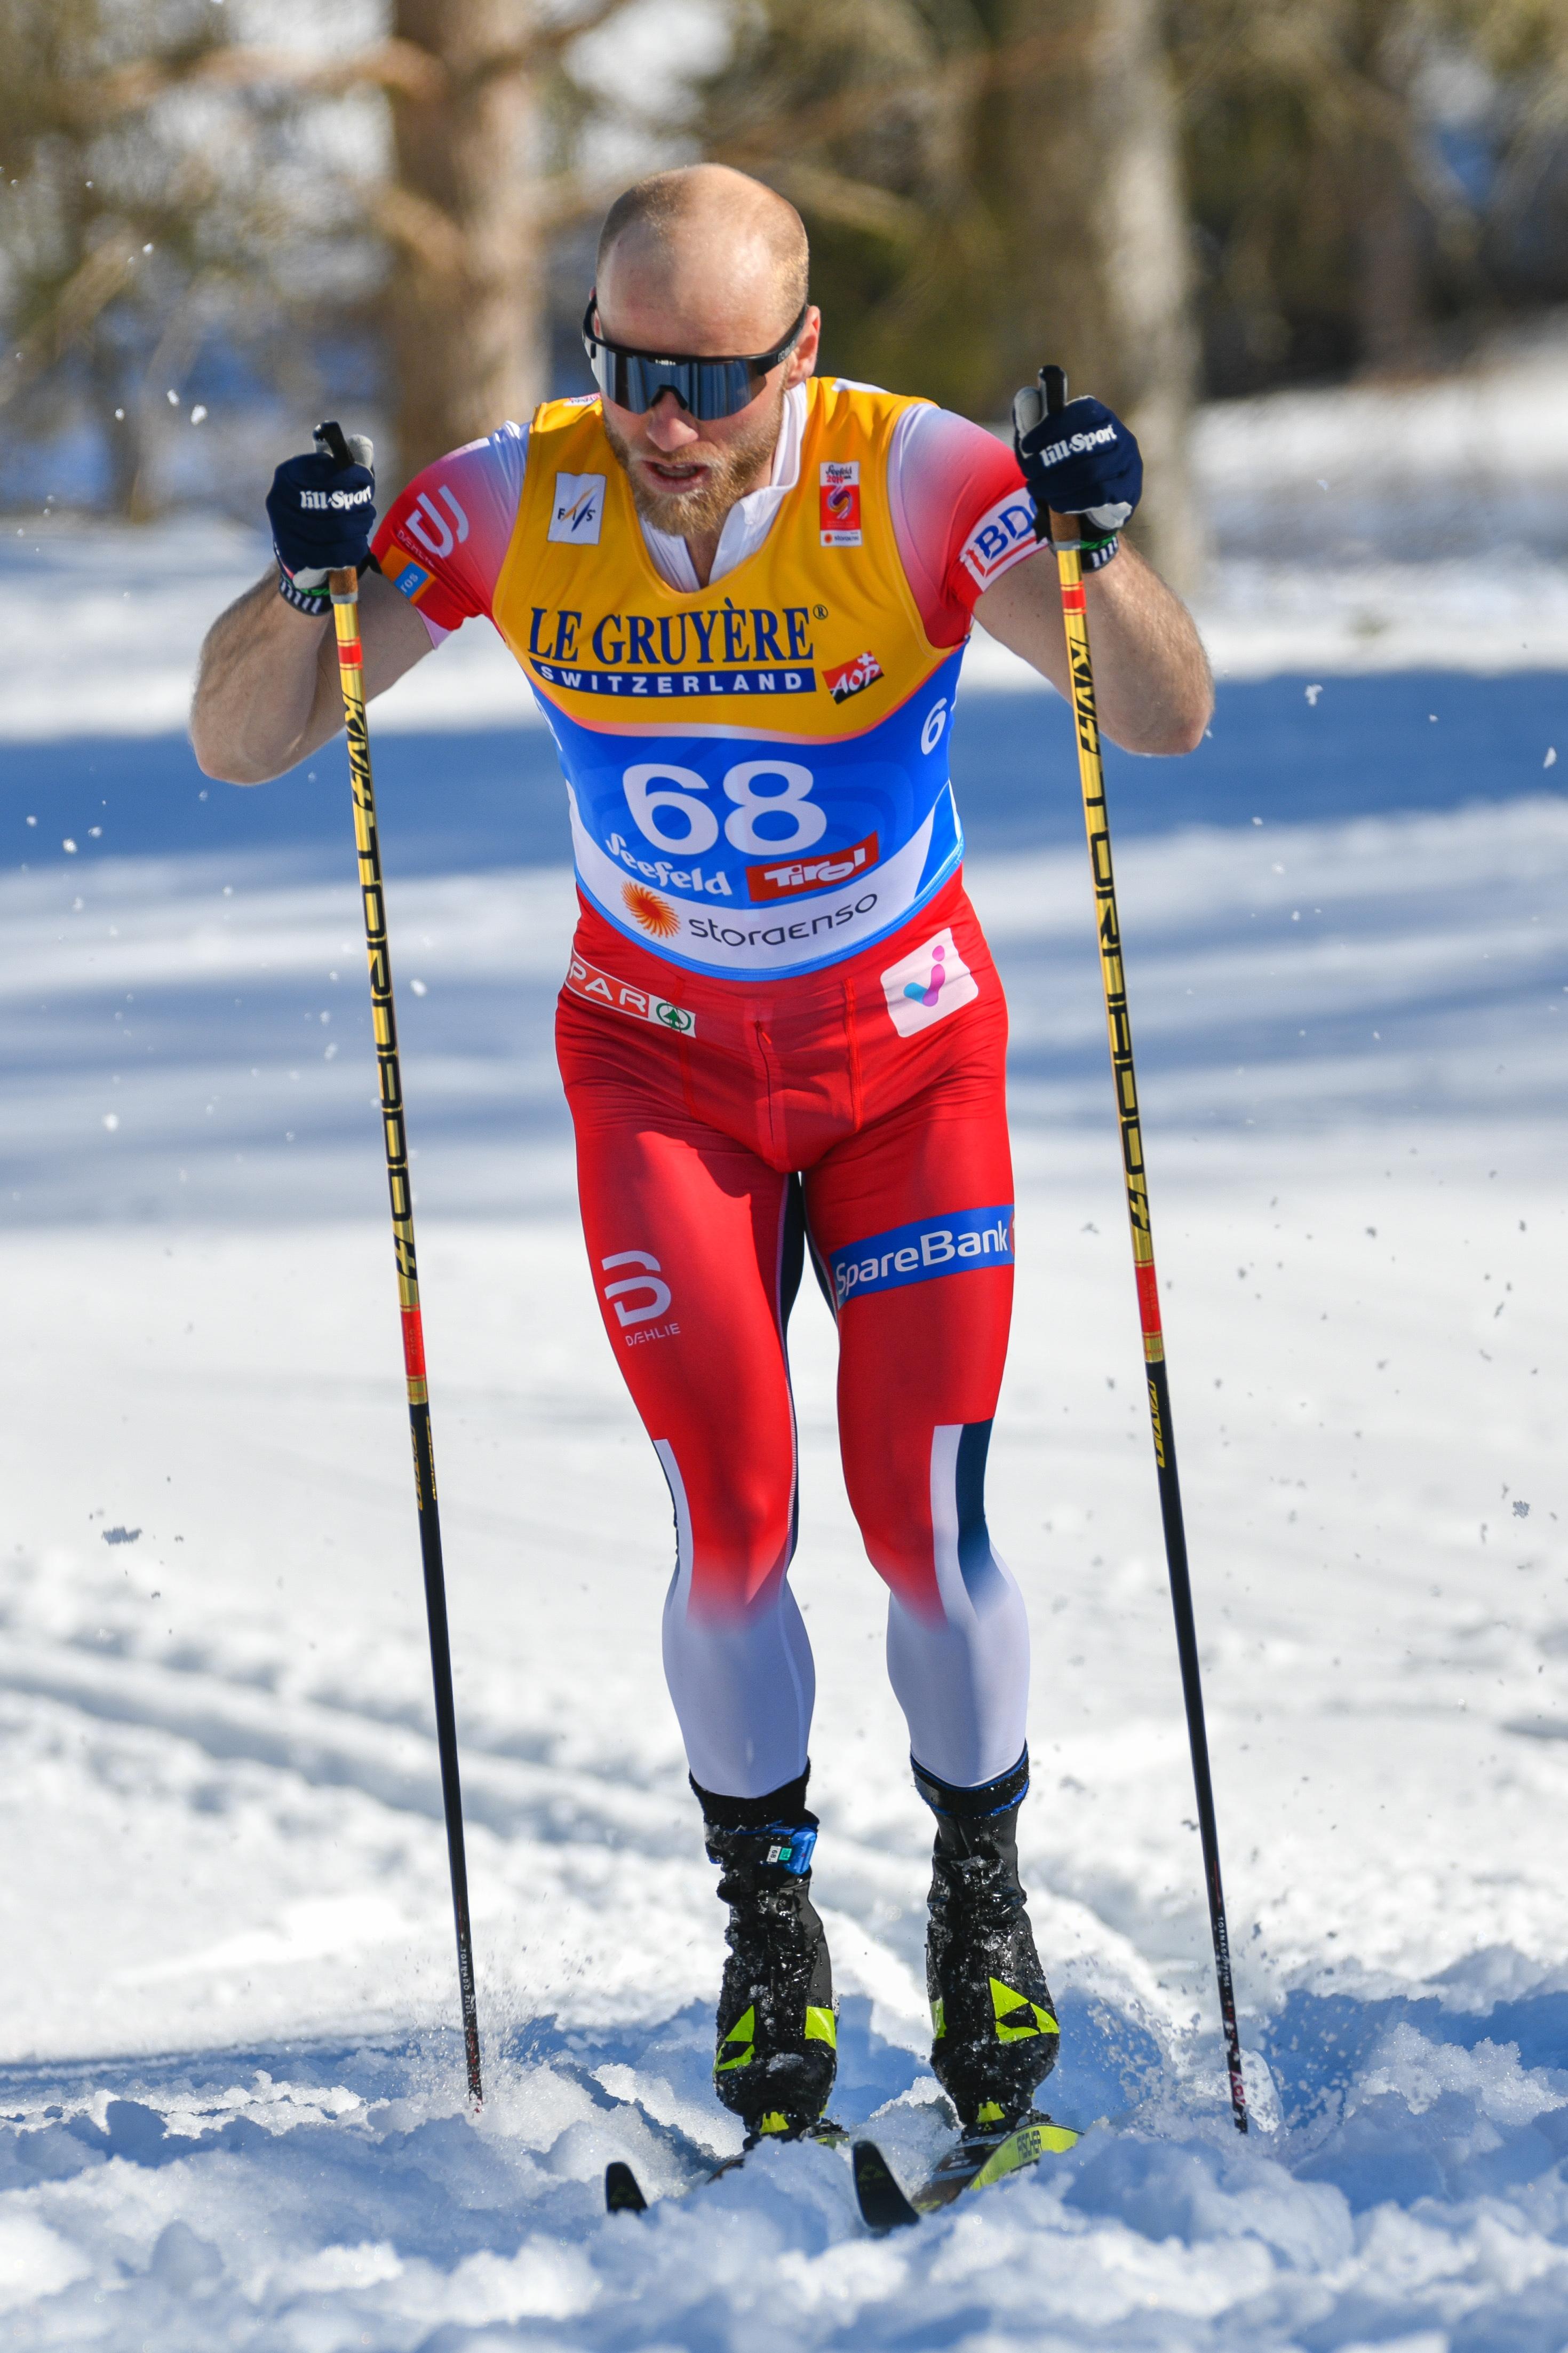 File 20190227 Fis Nwsc Seefeld Men Cc 15km Martin Johnsrud Sundby 850 4351 Jpg Wikimedia Commons